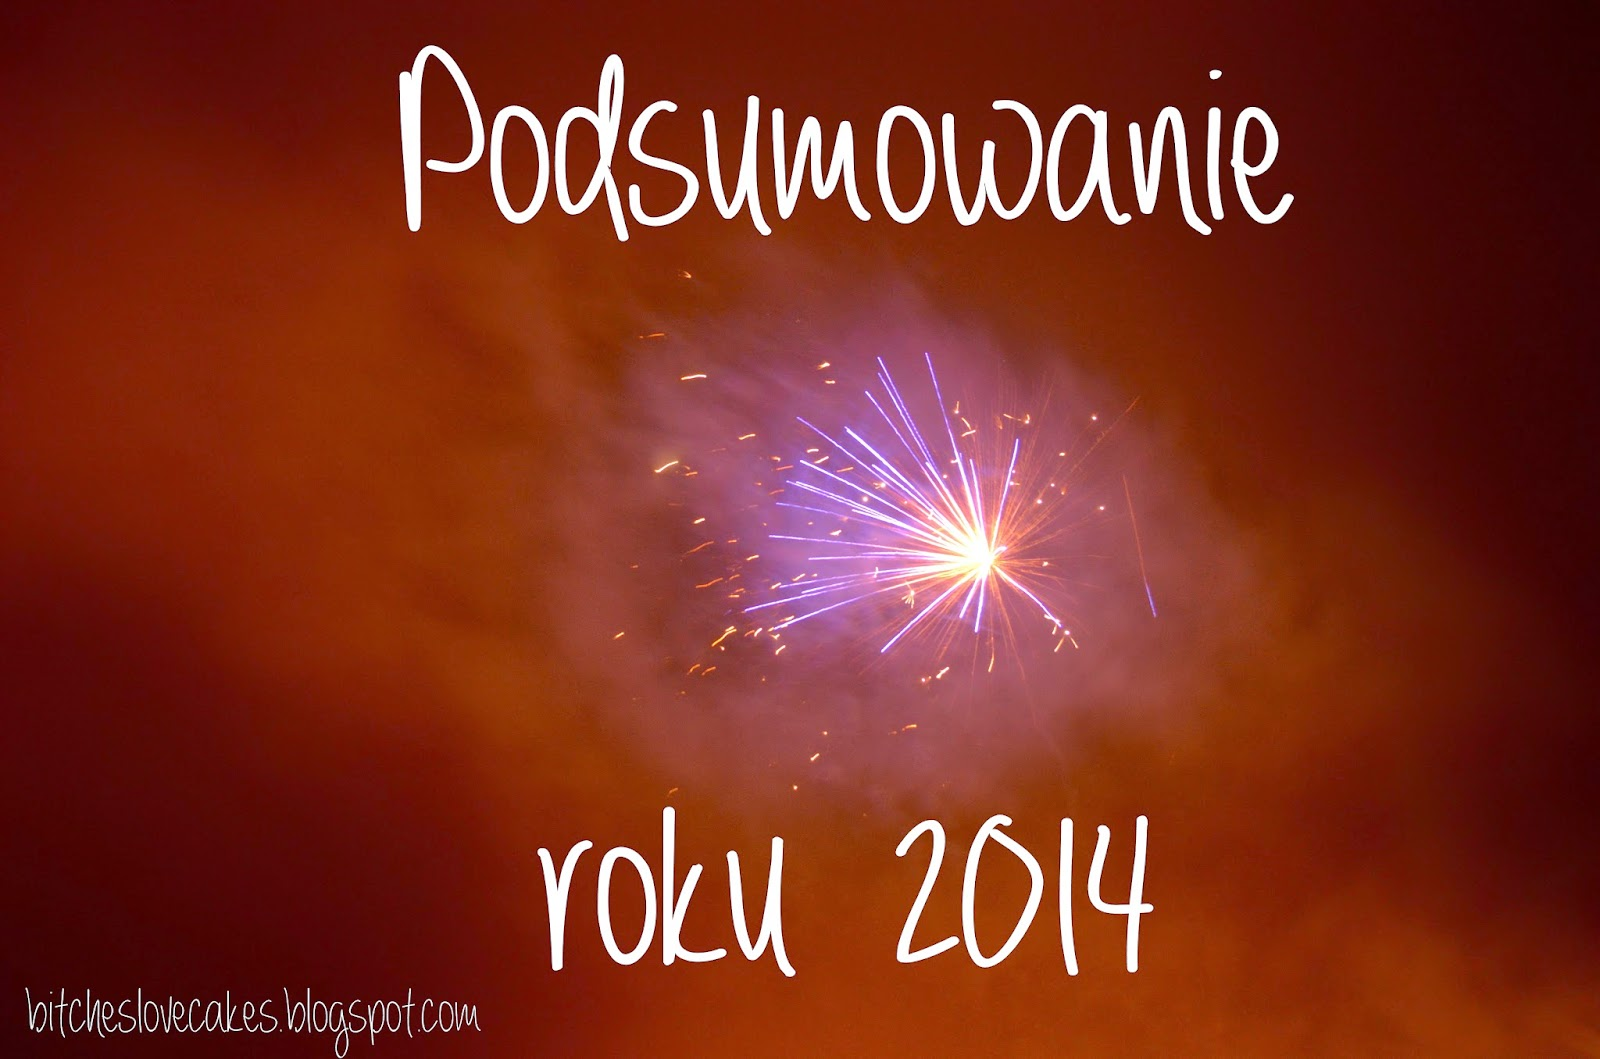 2014: Podsumowanie roku